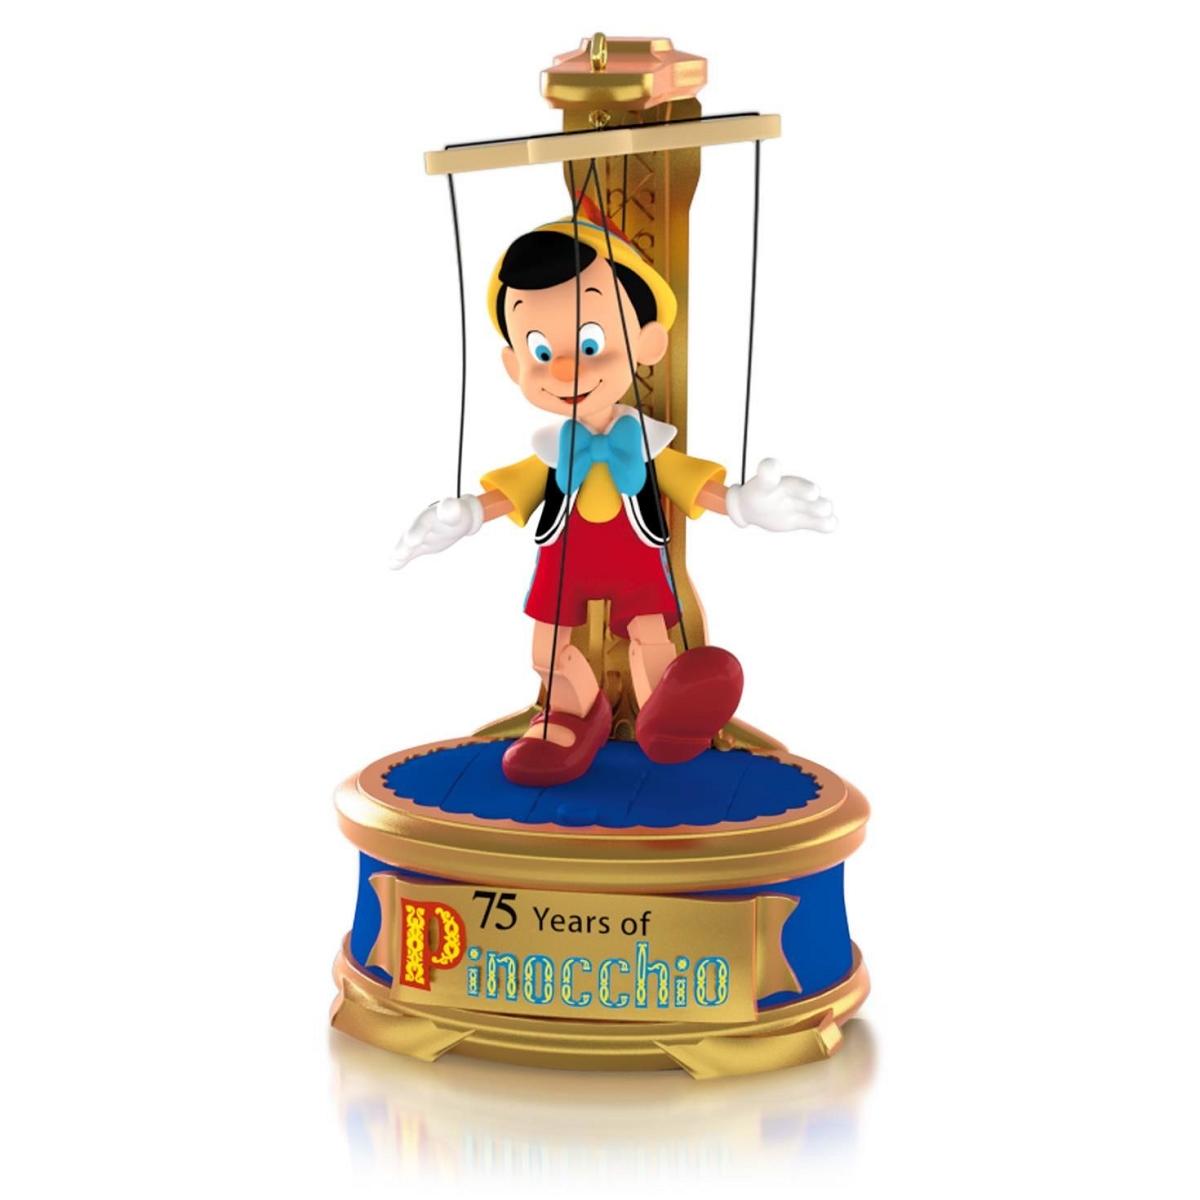 2015 Disney Pinocchio 75th Anniversary Hallmark Keepsake